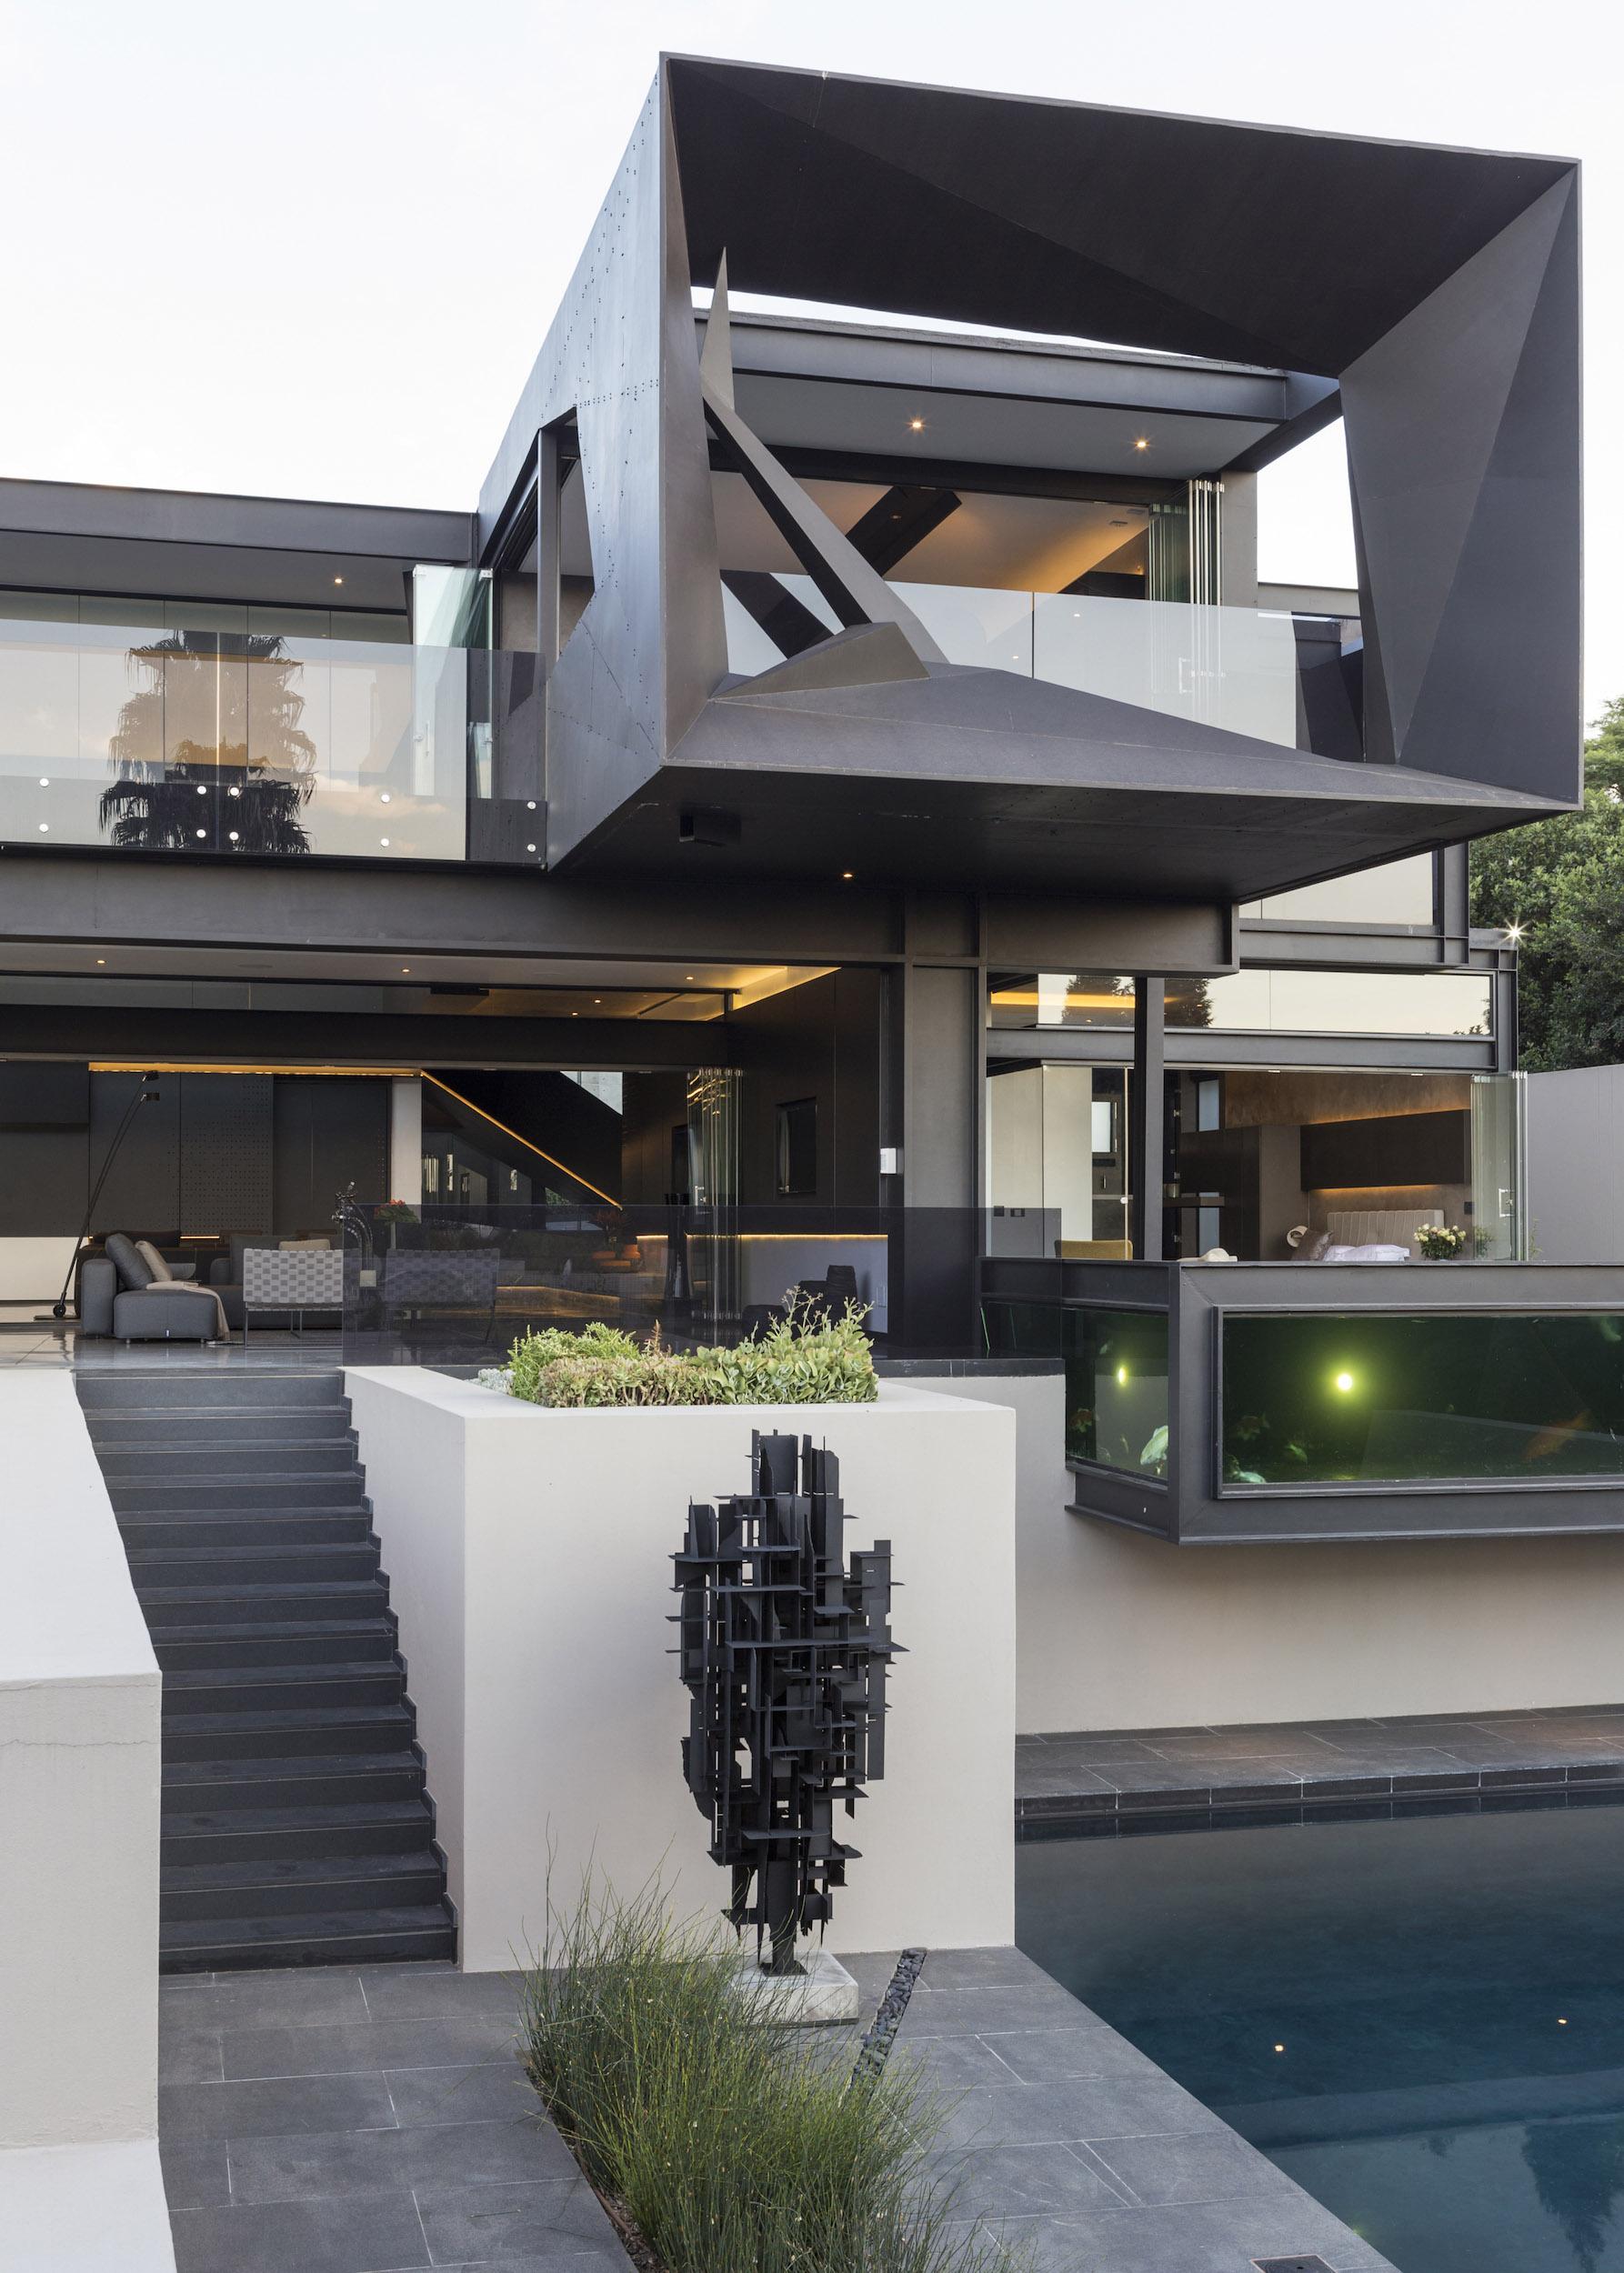 Kloof Road Masterpiece House in Johannesburg by Nico van der Meulen Architects-13